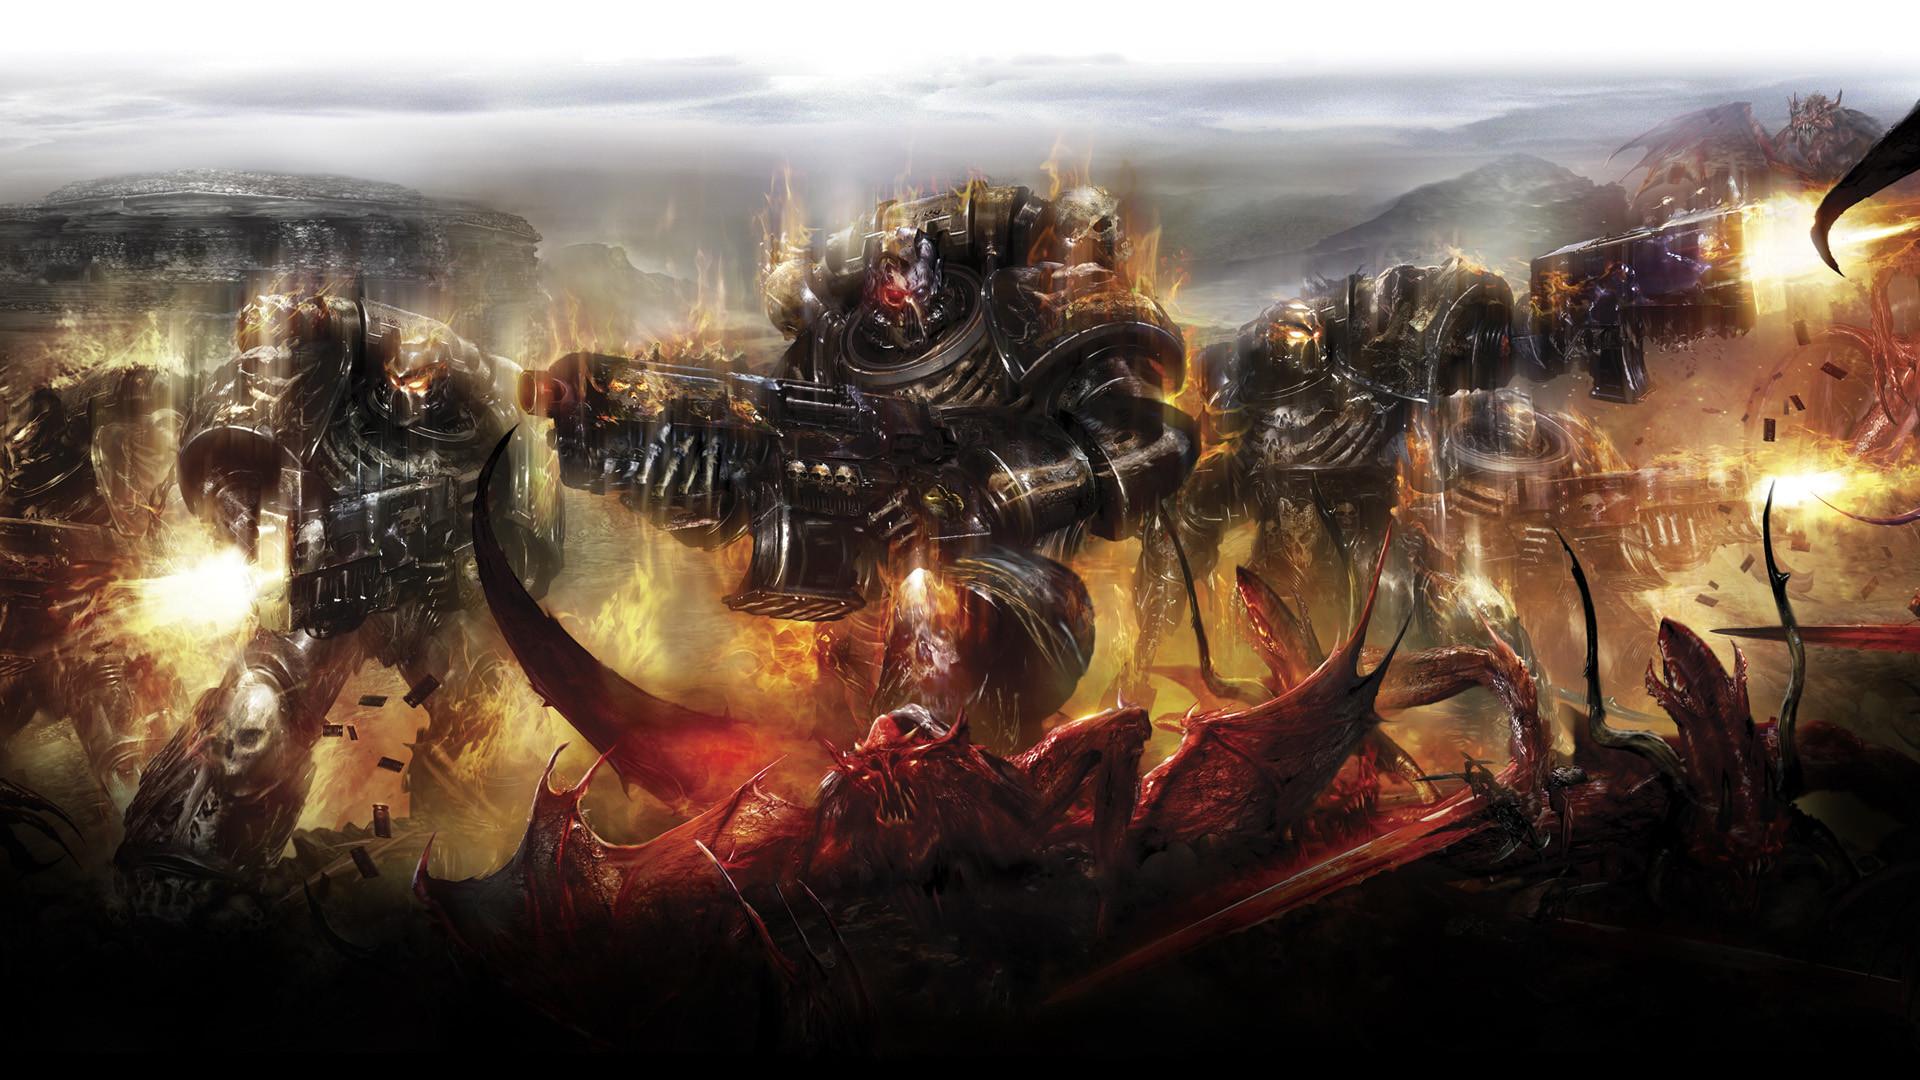 Warhammer 40K Res: HD / Size:584kb. Views: 173697